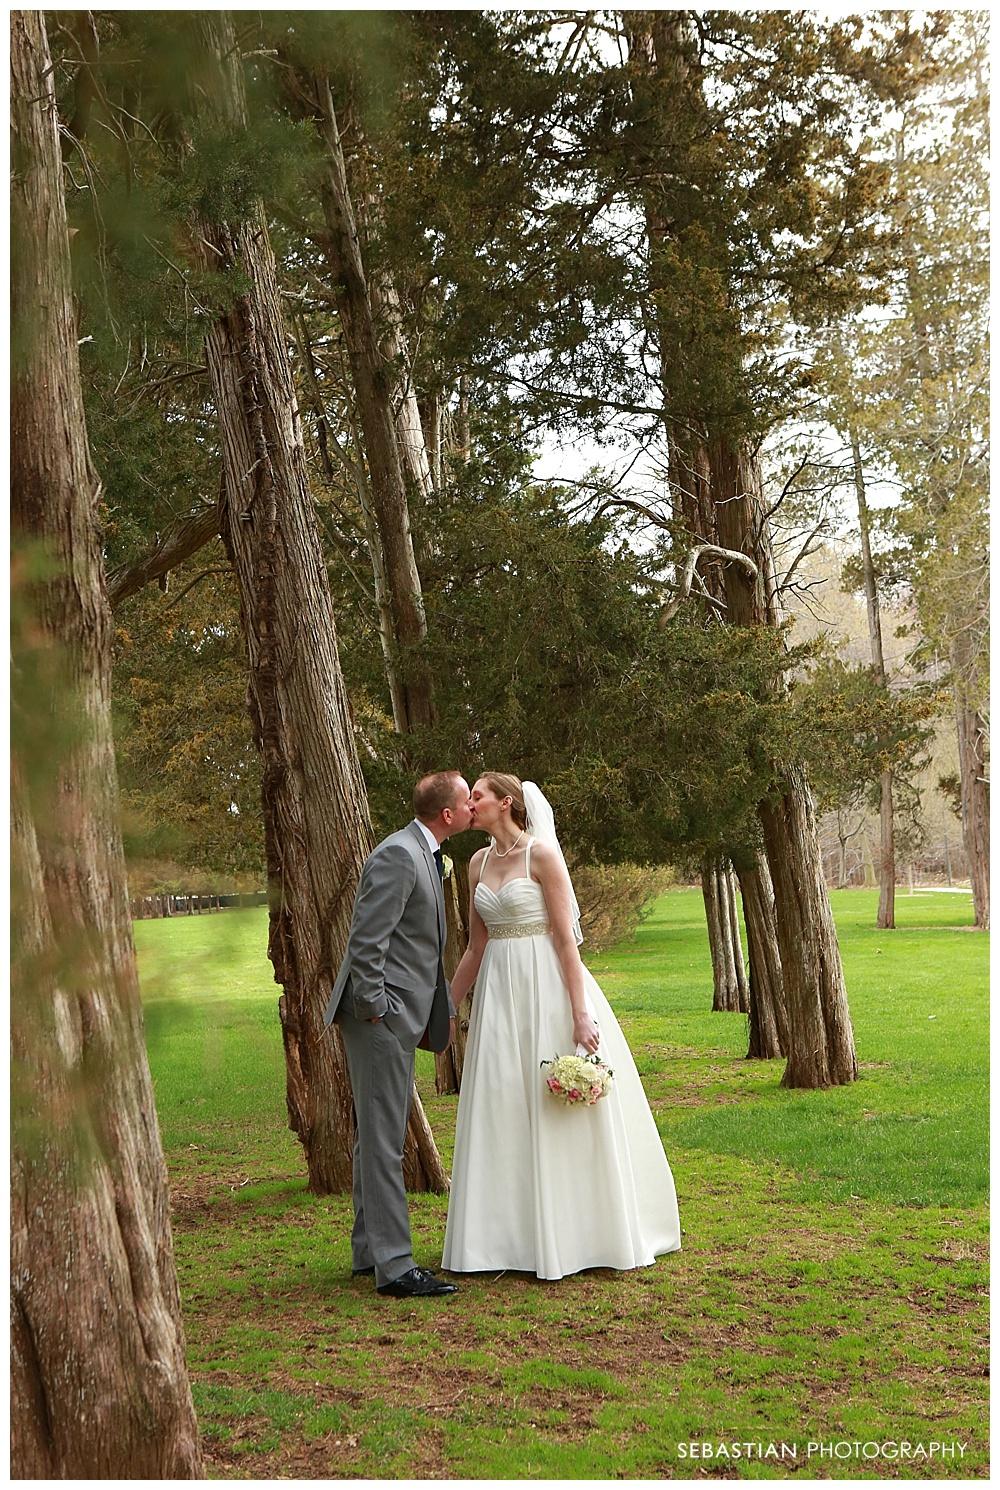 Sebastian_Photography_Wadsworth_Mansion_Middletown_CT_Wedding_Portraits_Spring16.jpg